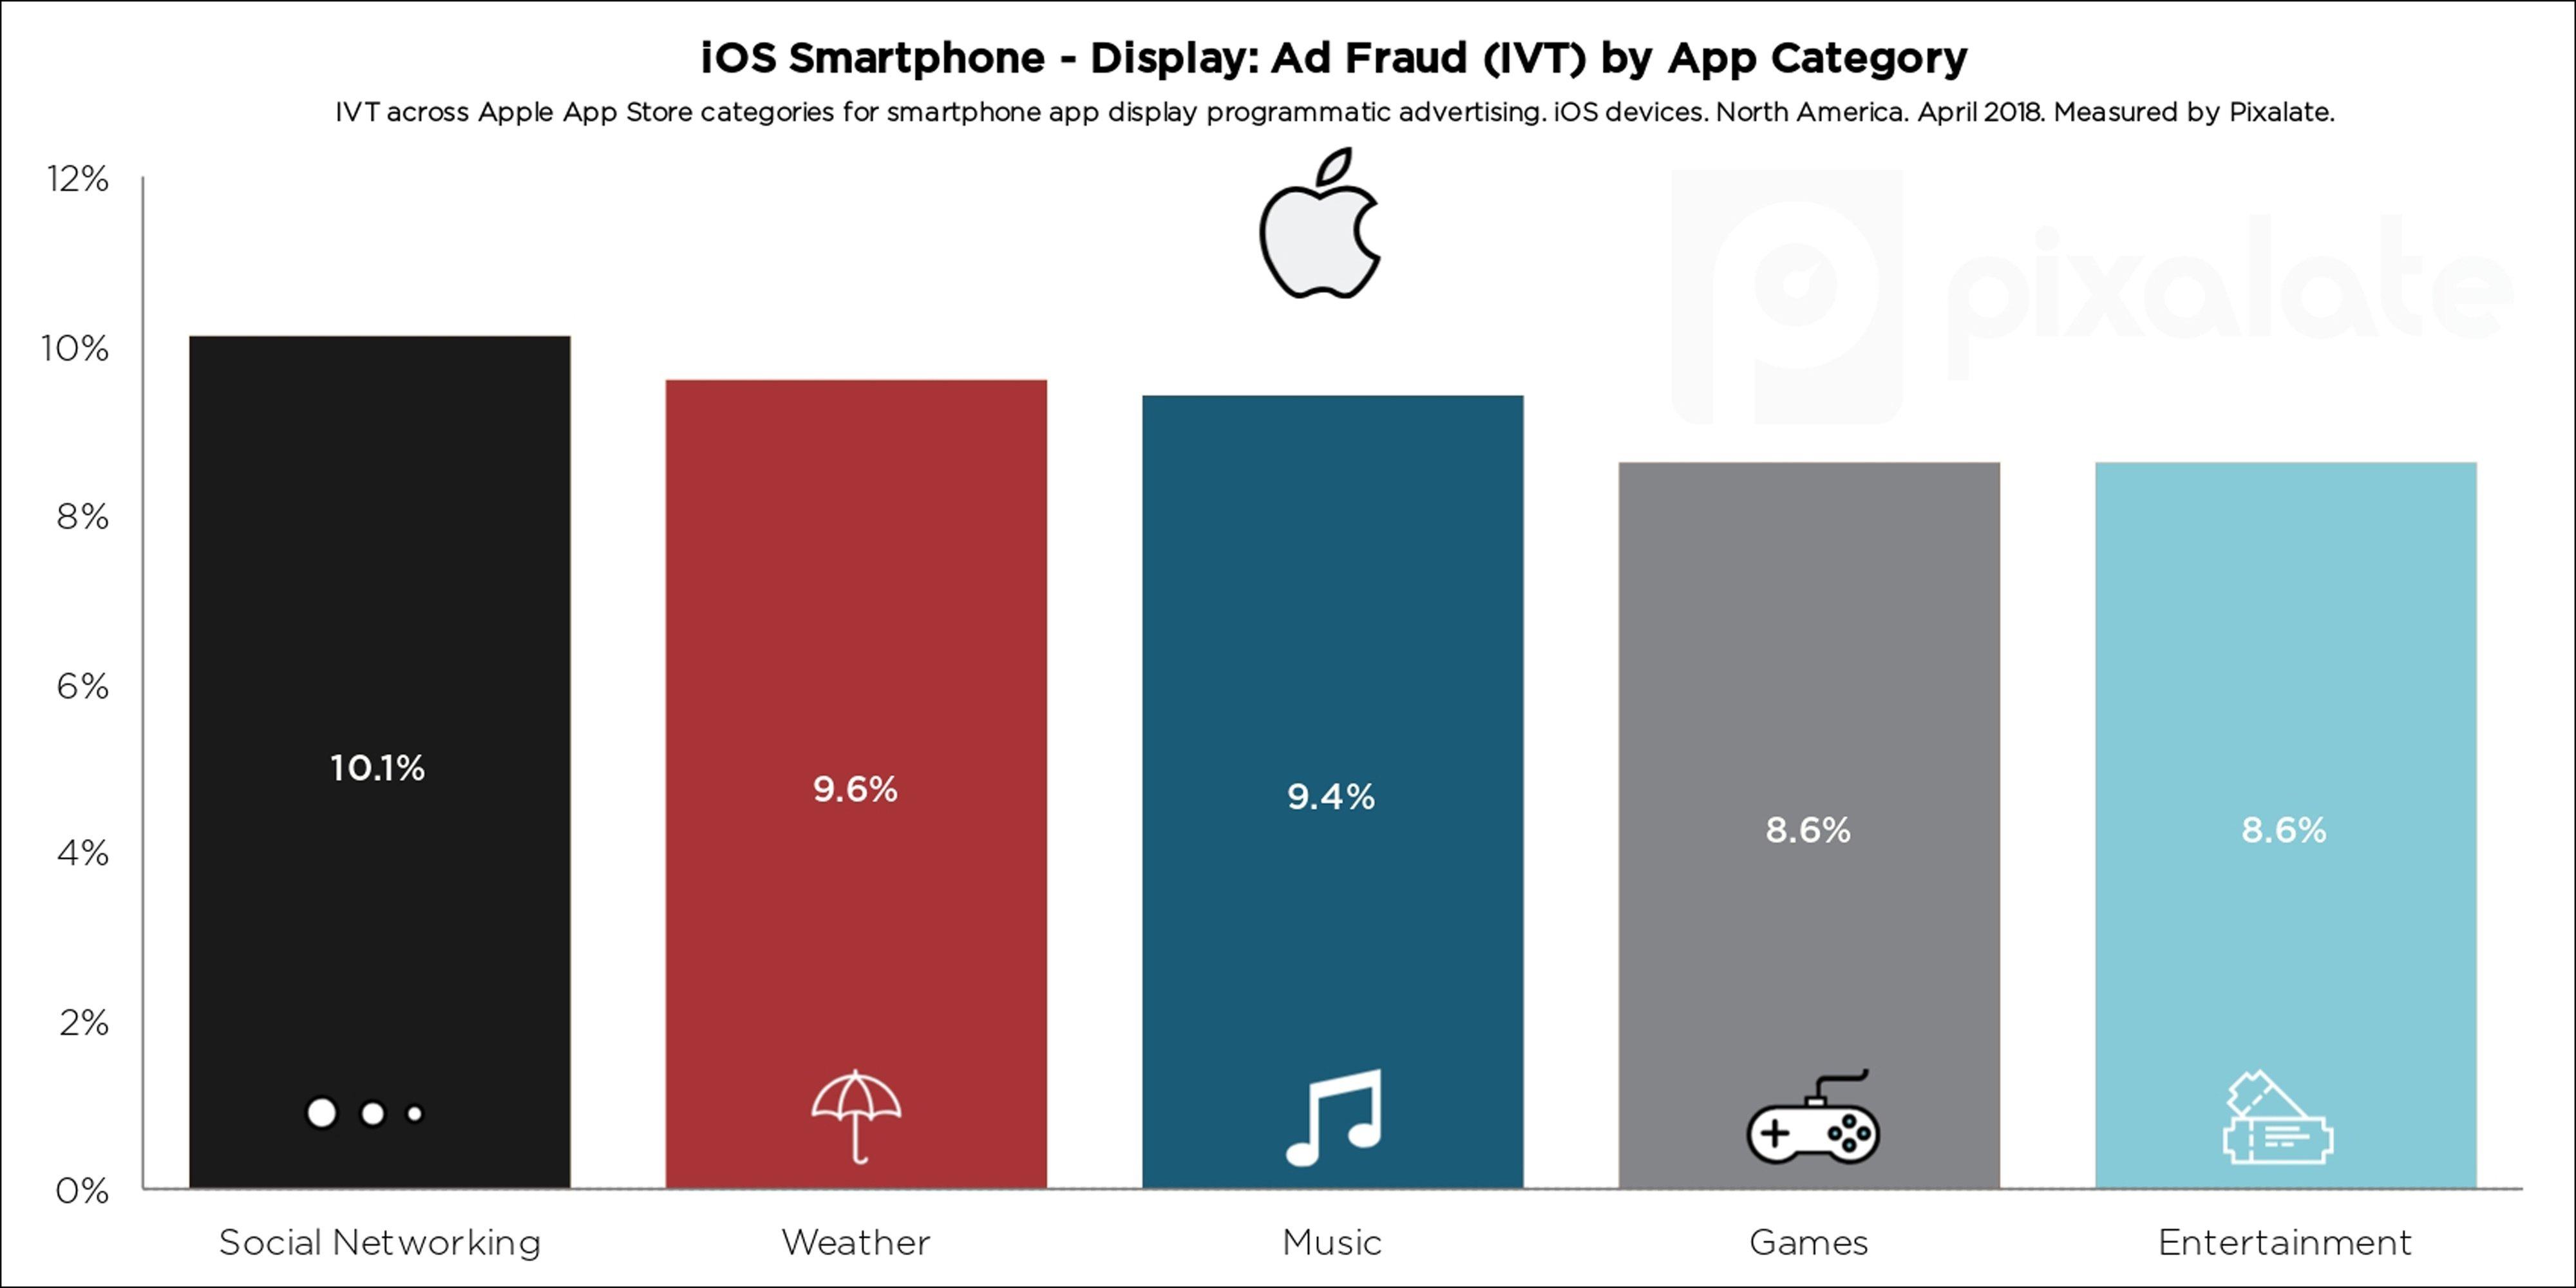 blog-iOS-app-smartphone-display-q2-2018